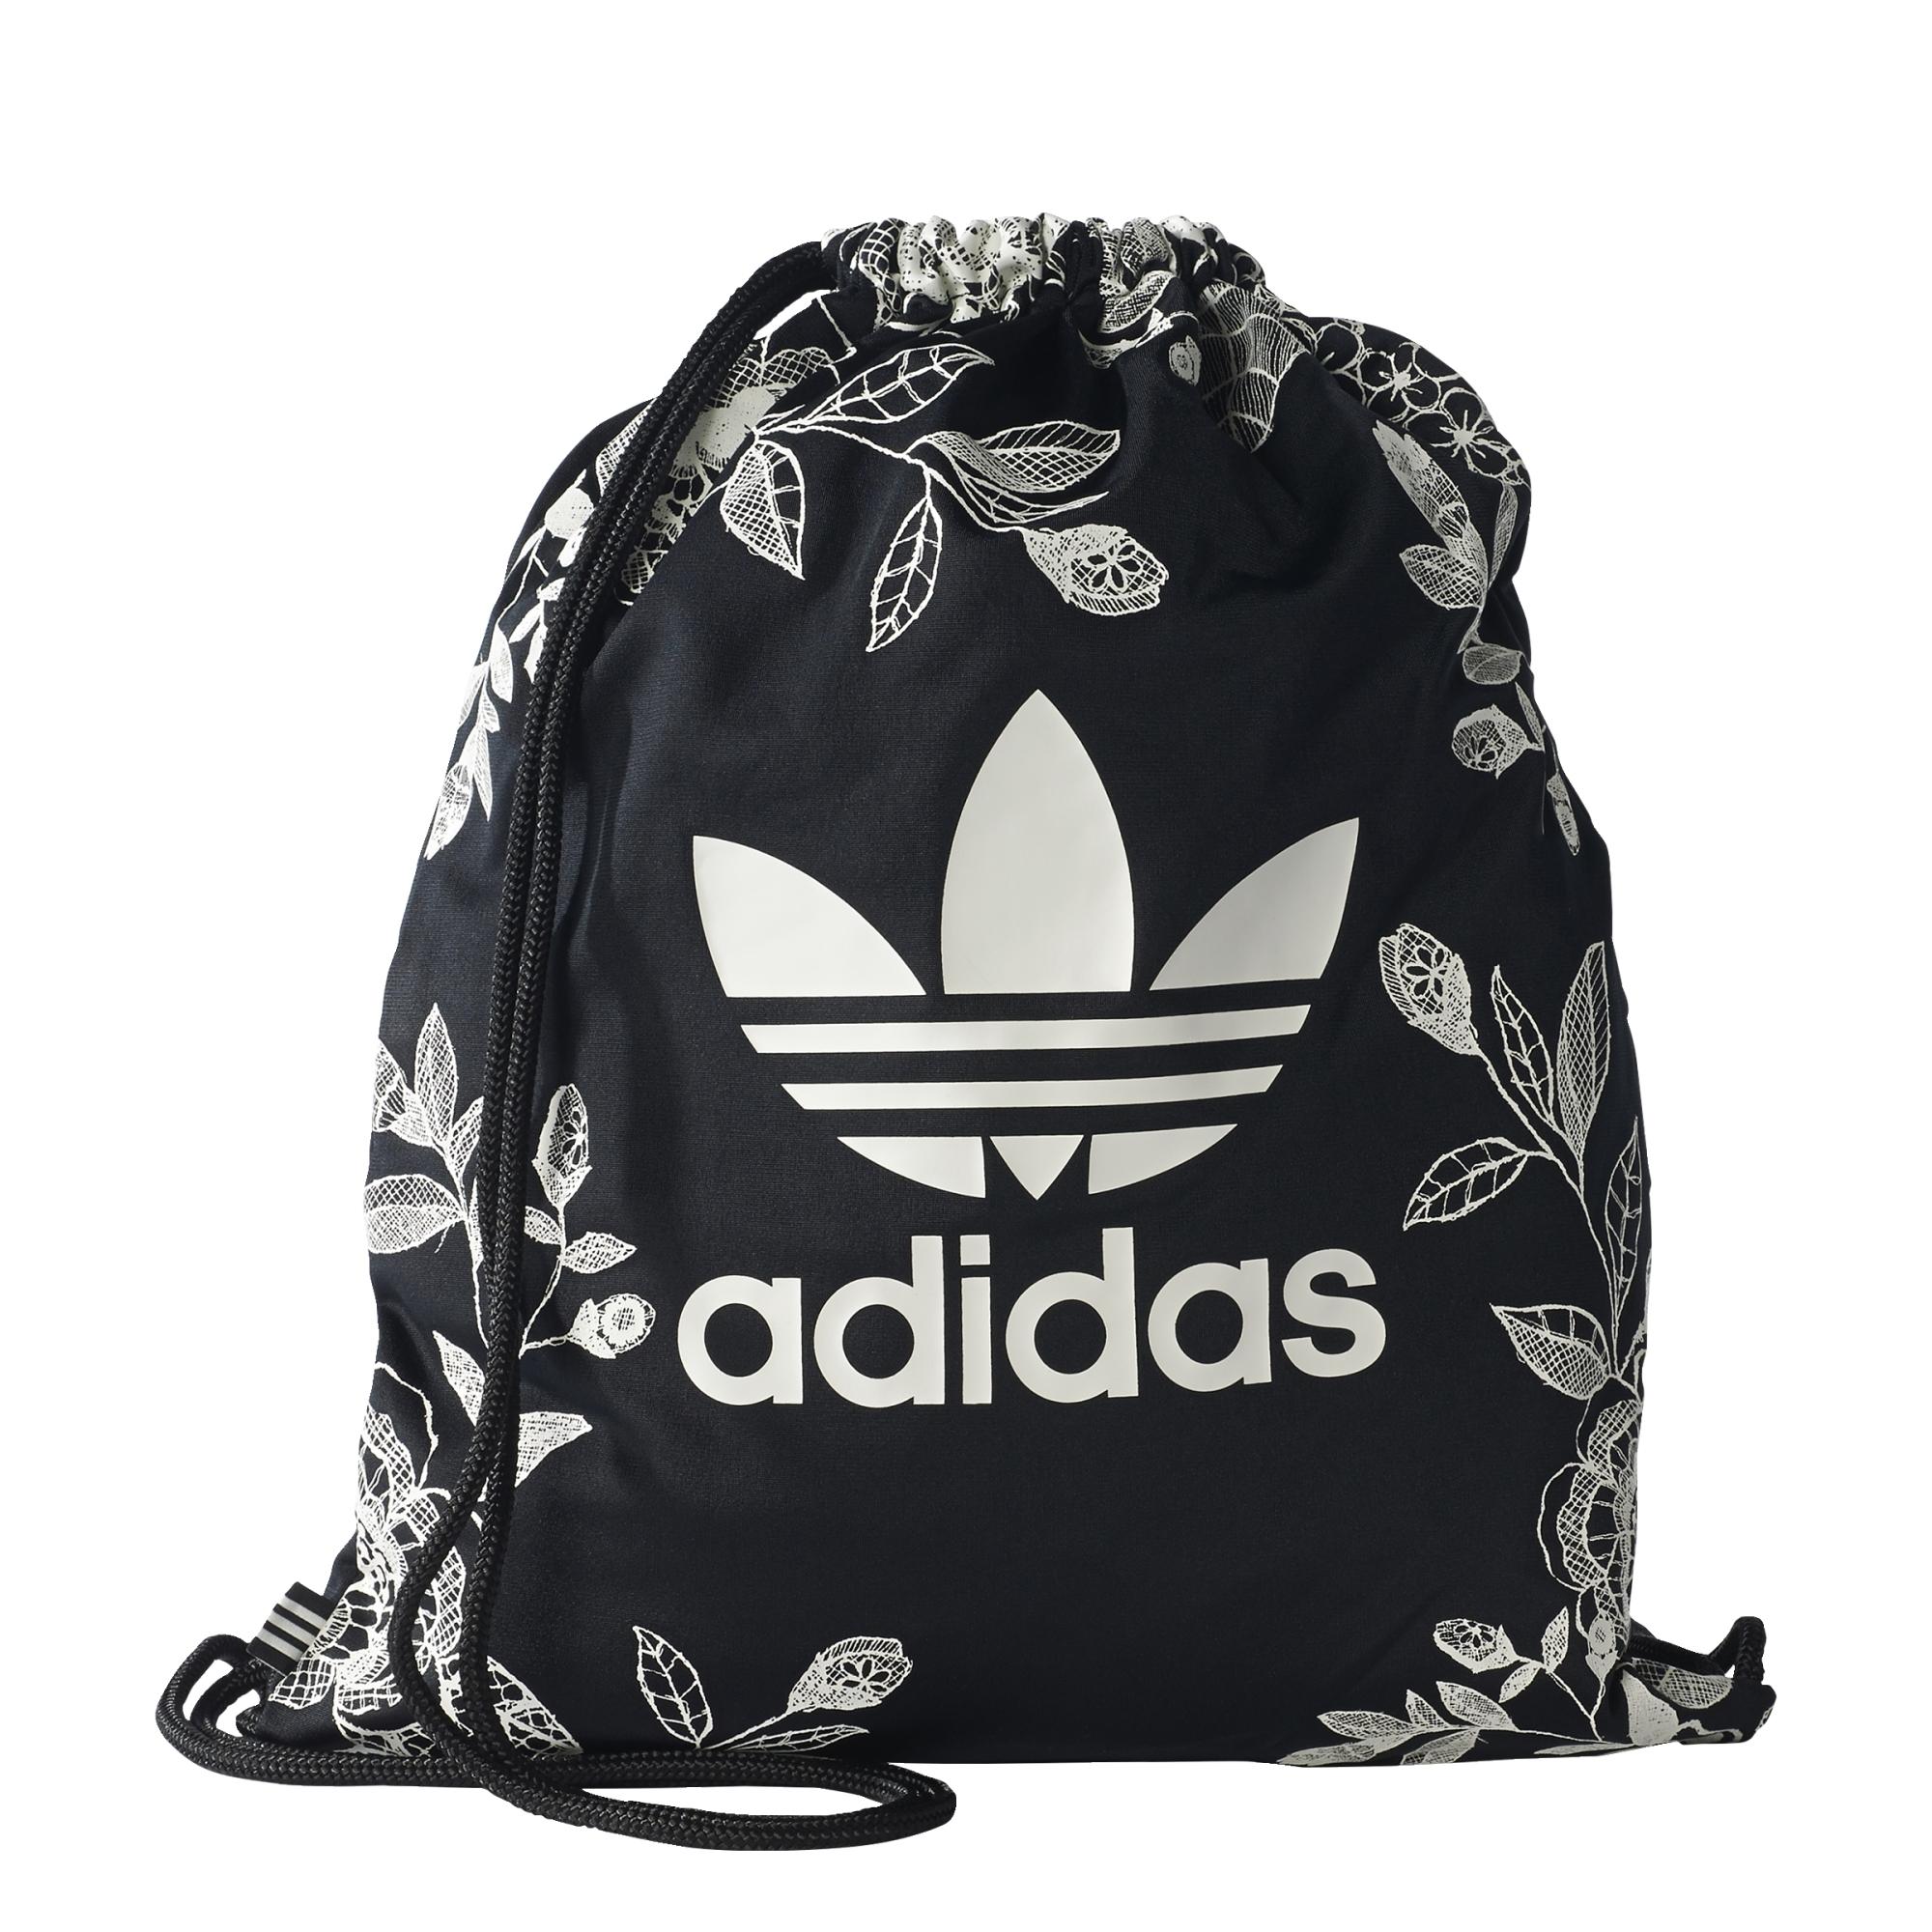 Adidas Originals Giza Gymsack (black white). Oferta 13% d61f1d6e724